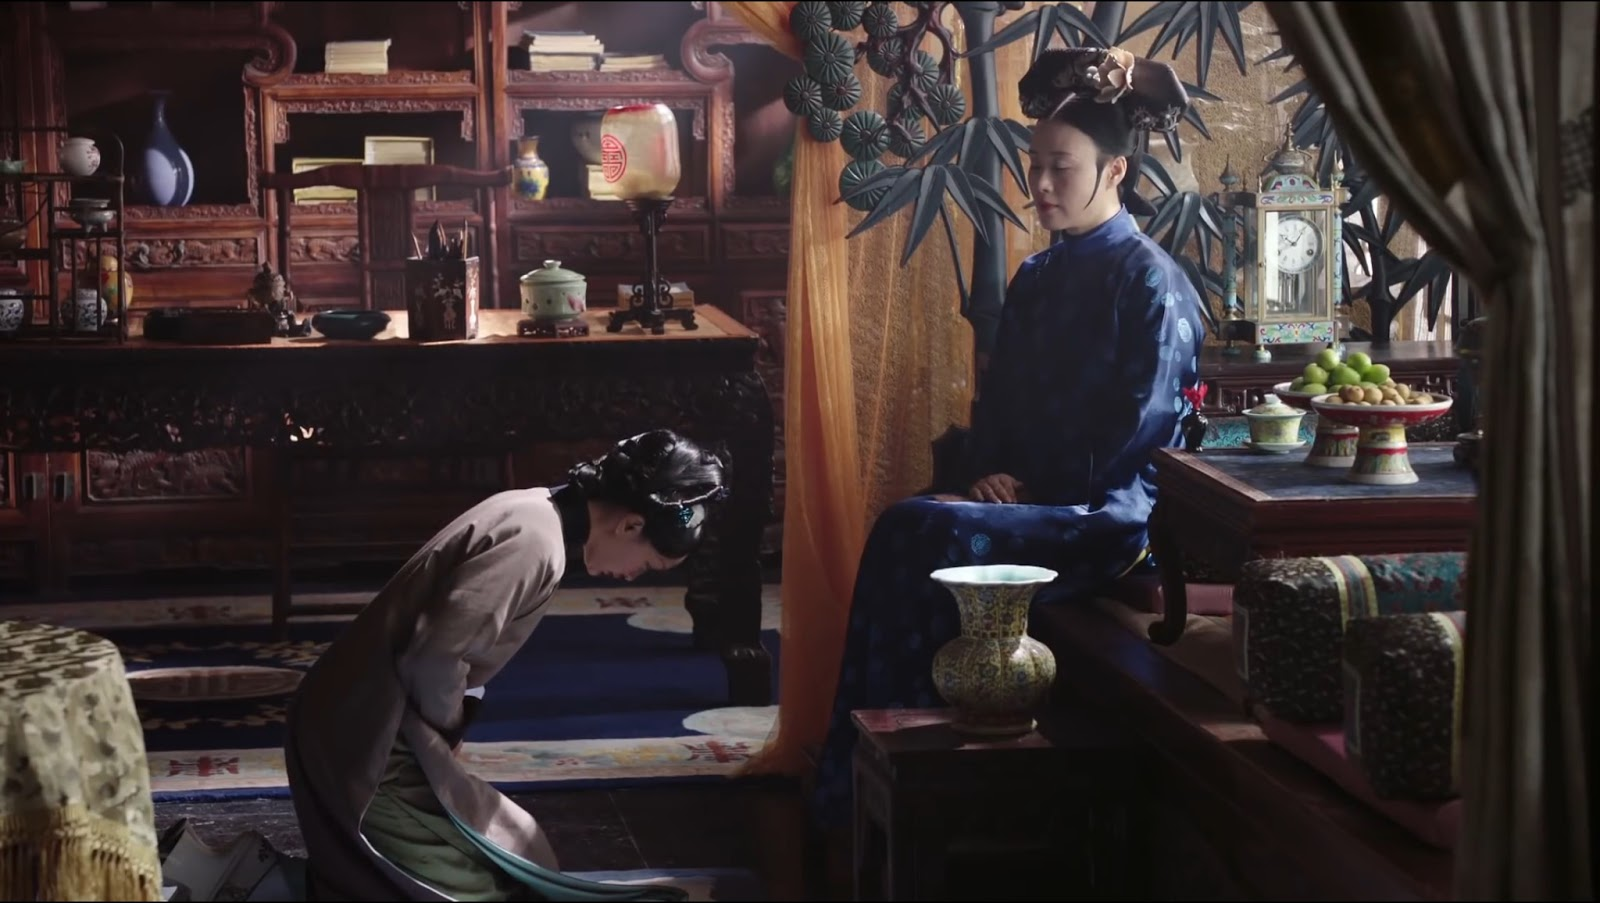 Image from Drama Panda